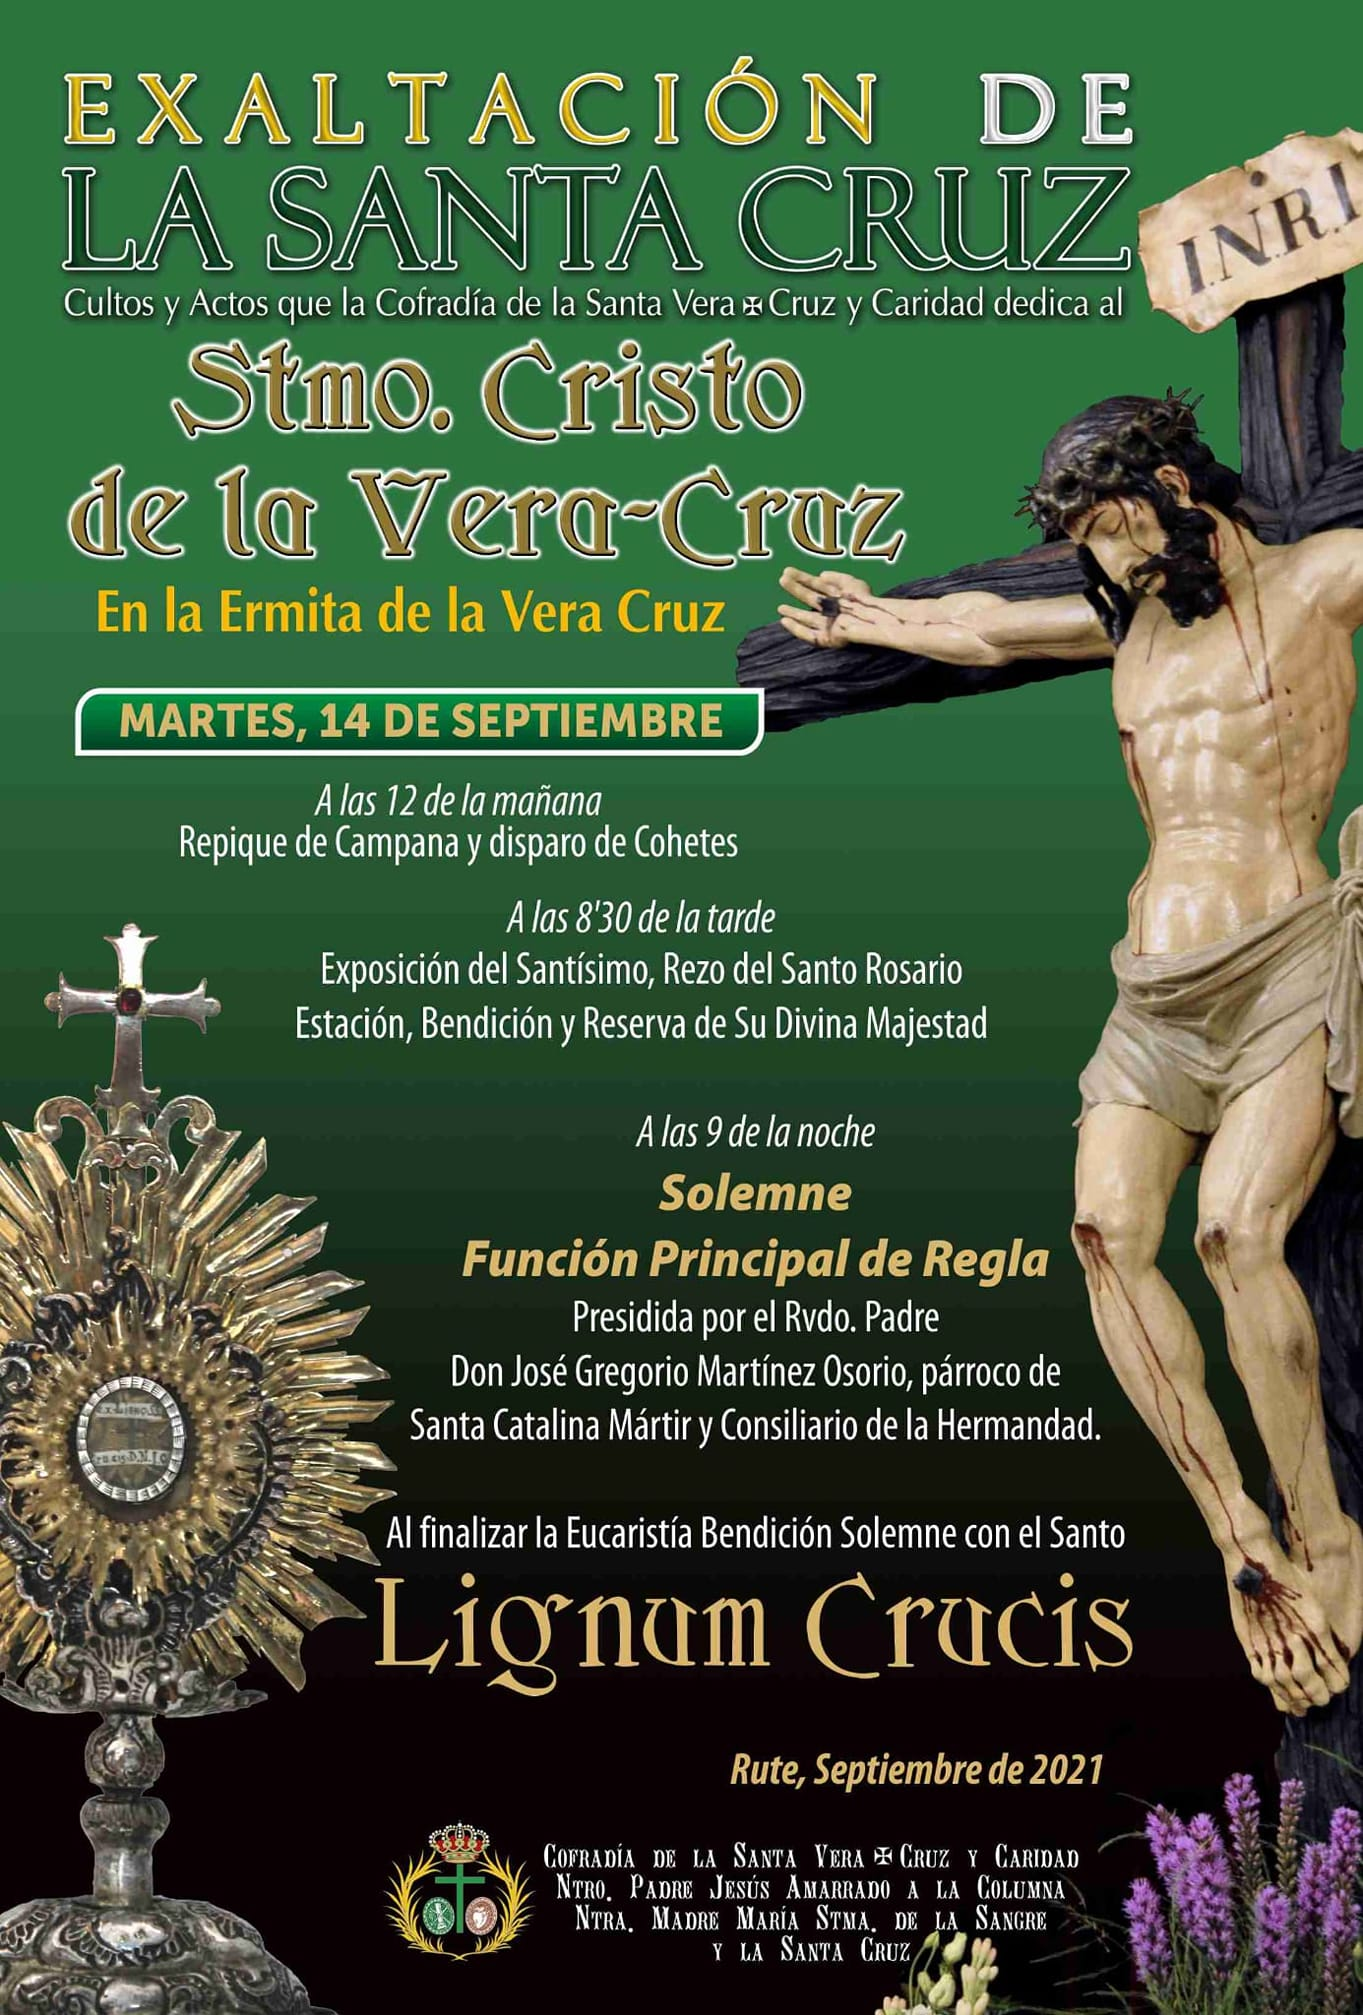 www.lignumcrucis.es-vera-cruz-rute-proclama-exaltacion-2021